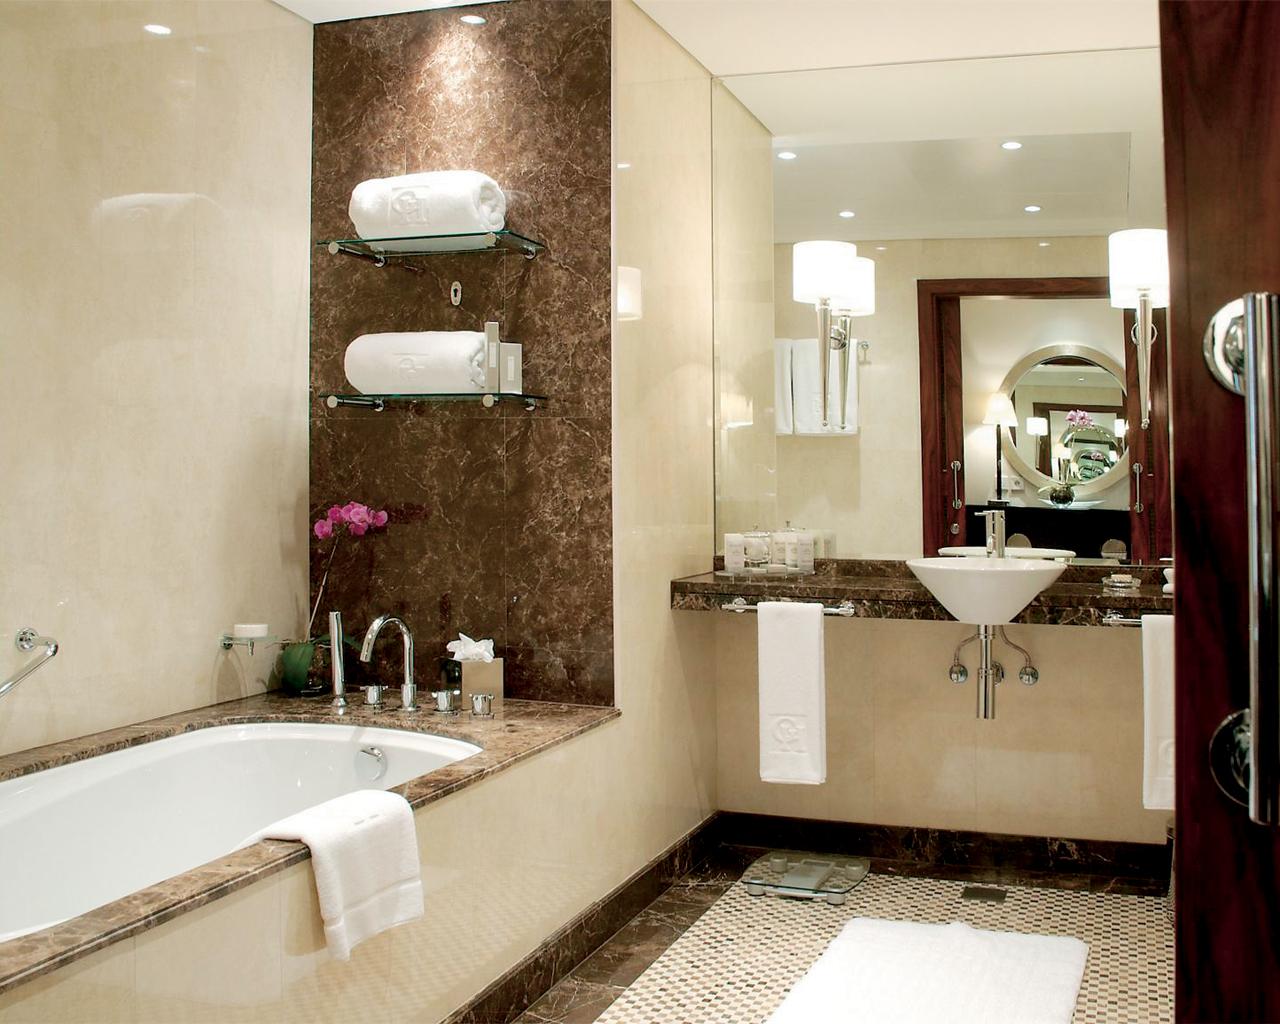 Стиль ванны